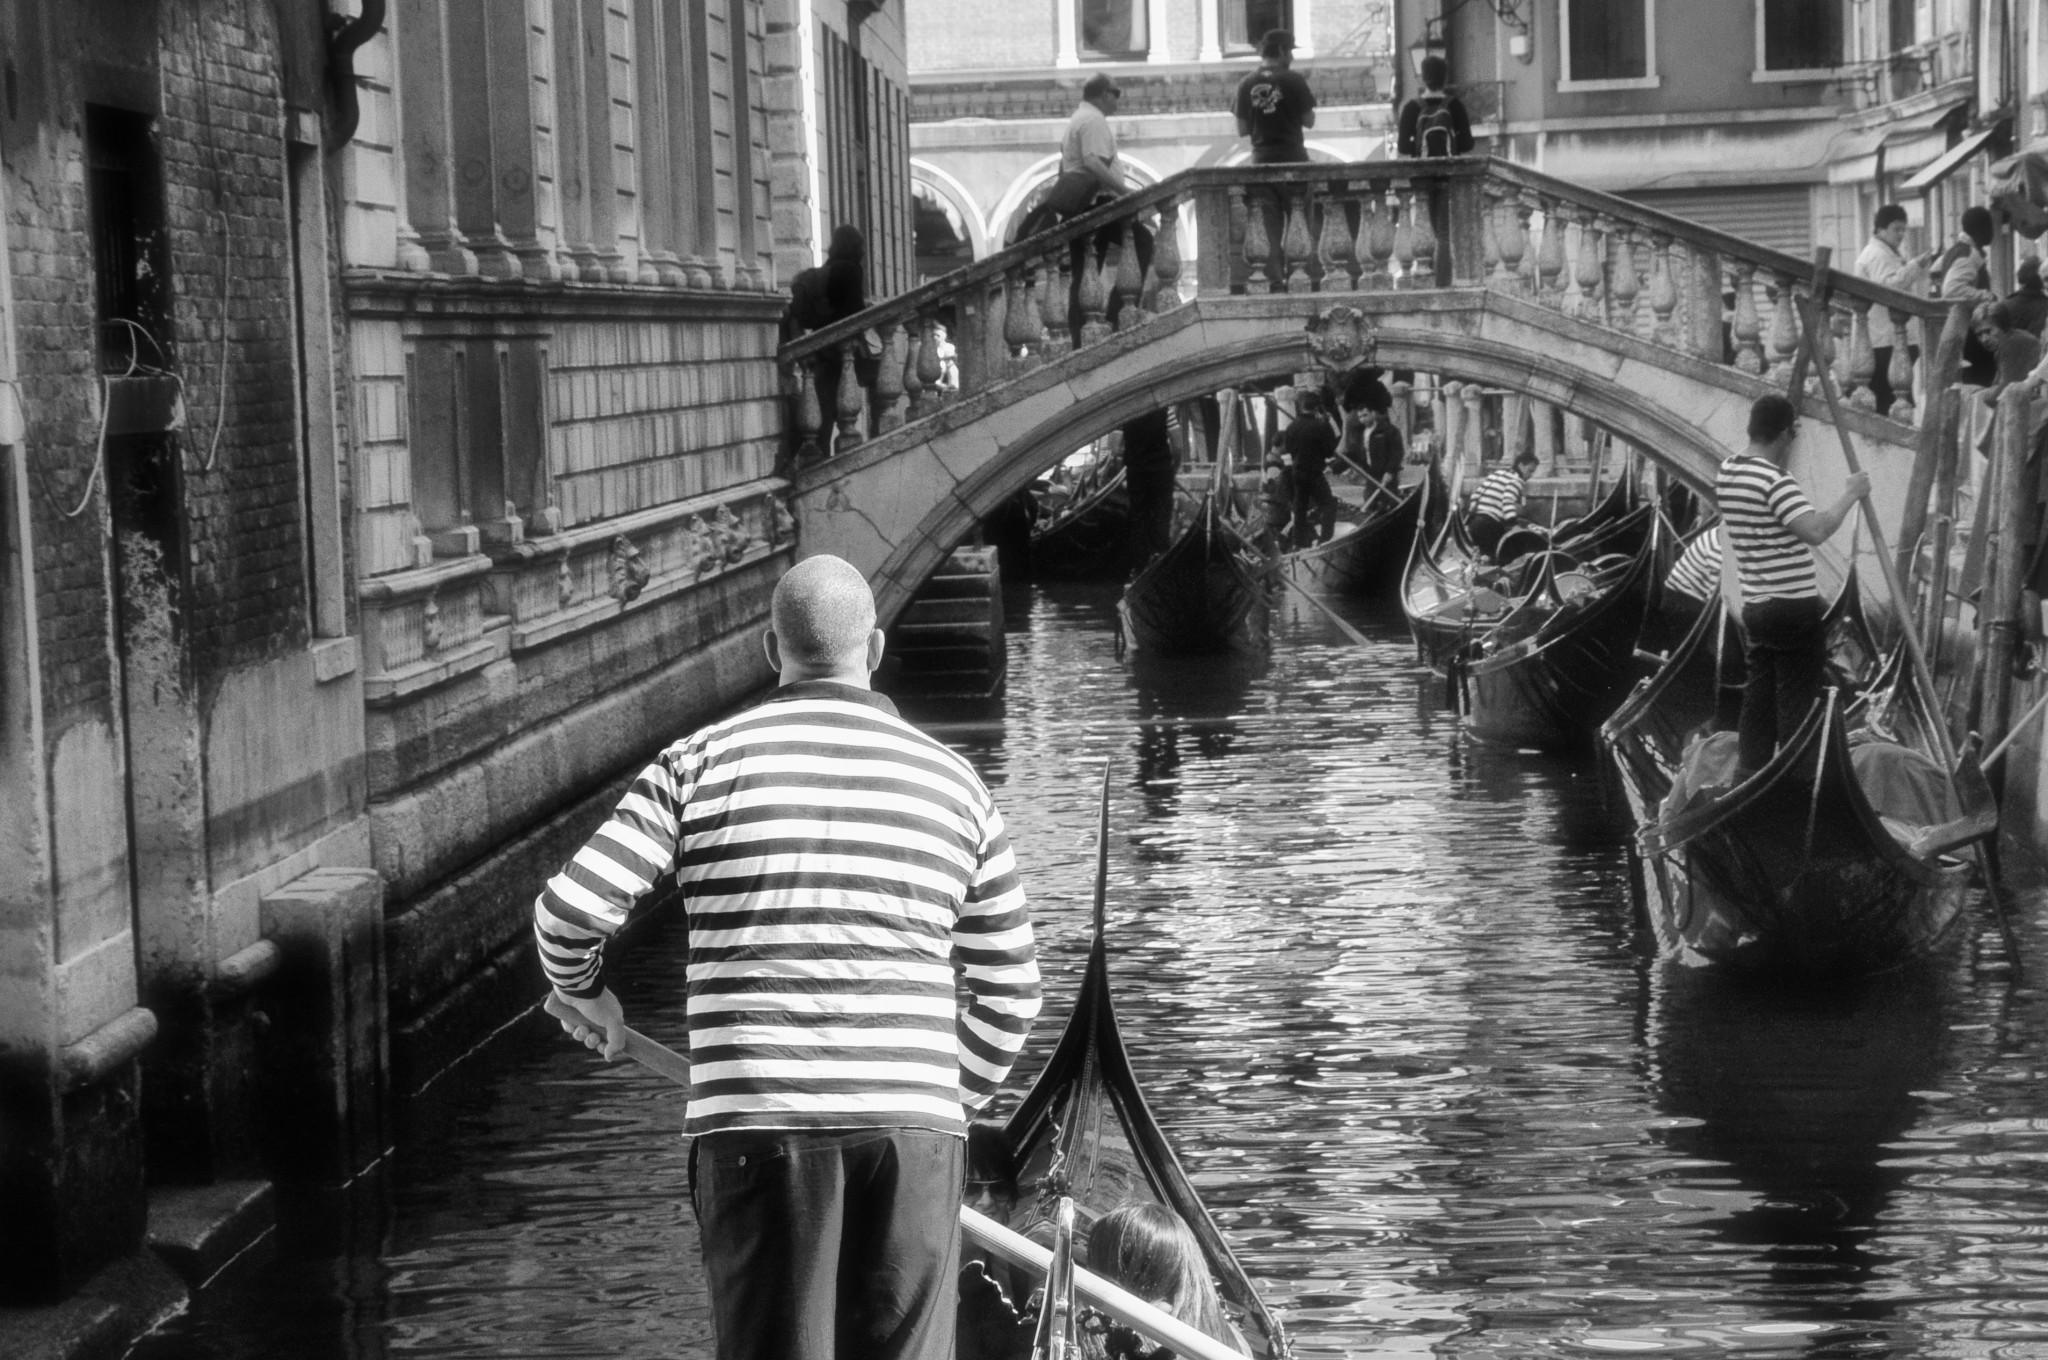 Gondolas and gondoliers of Venice